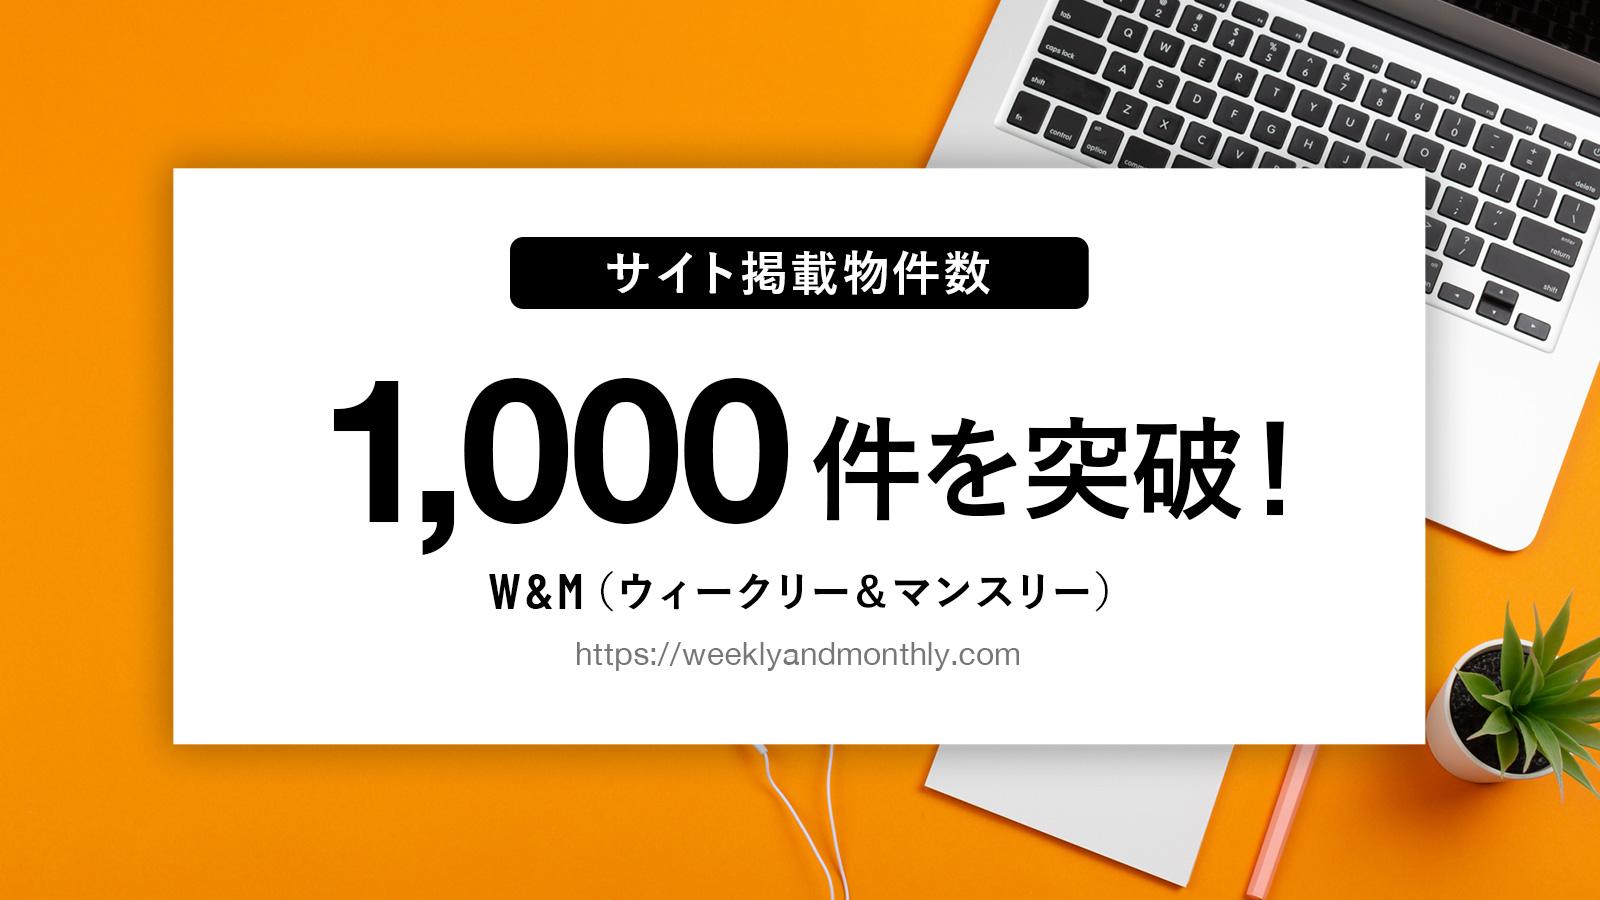 【PR】Weekly&Monthlyサイト掲載物件数1,000件を突破!